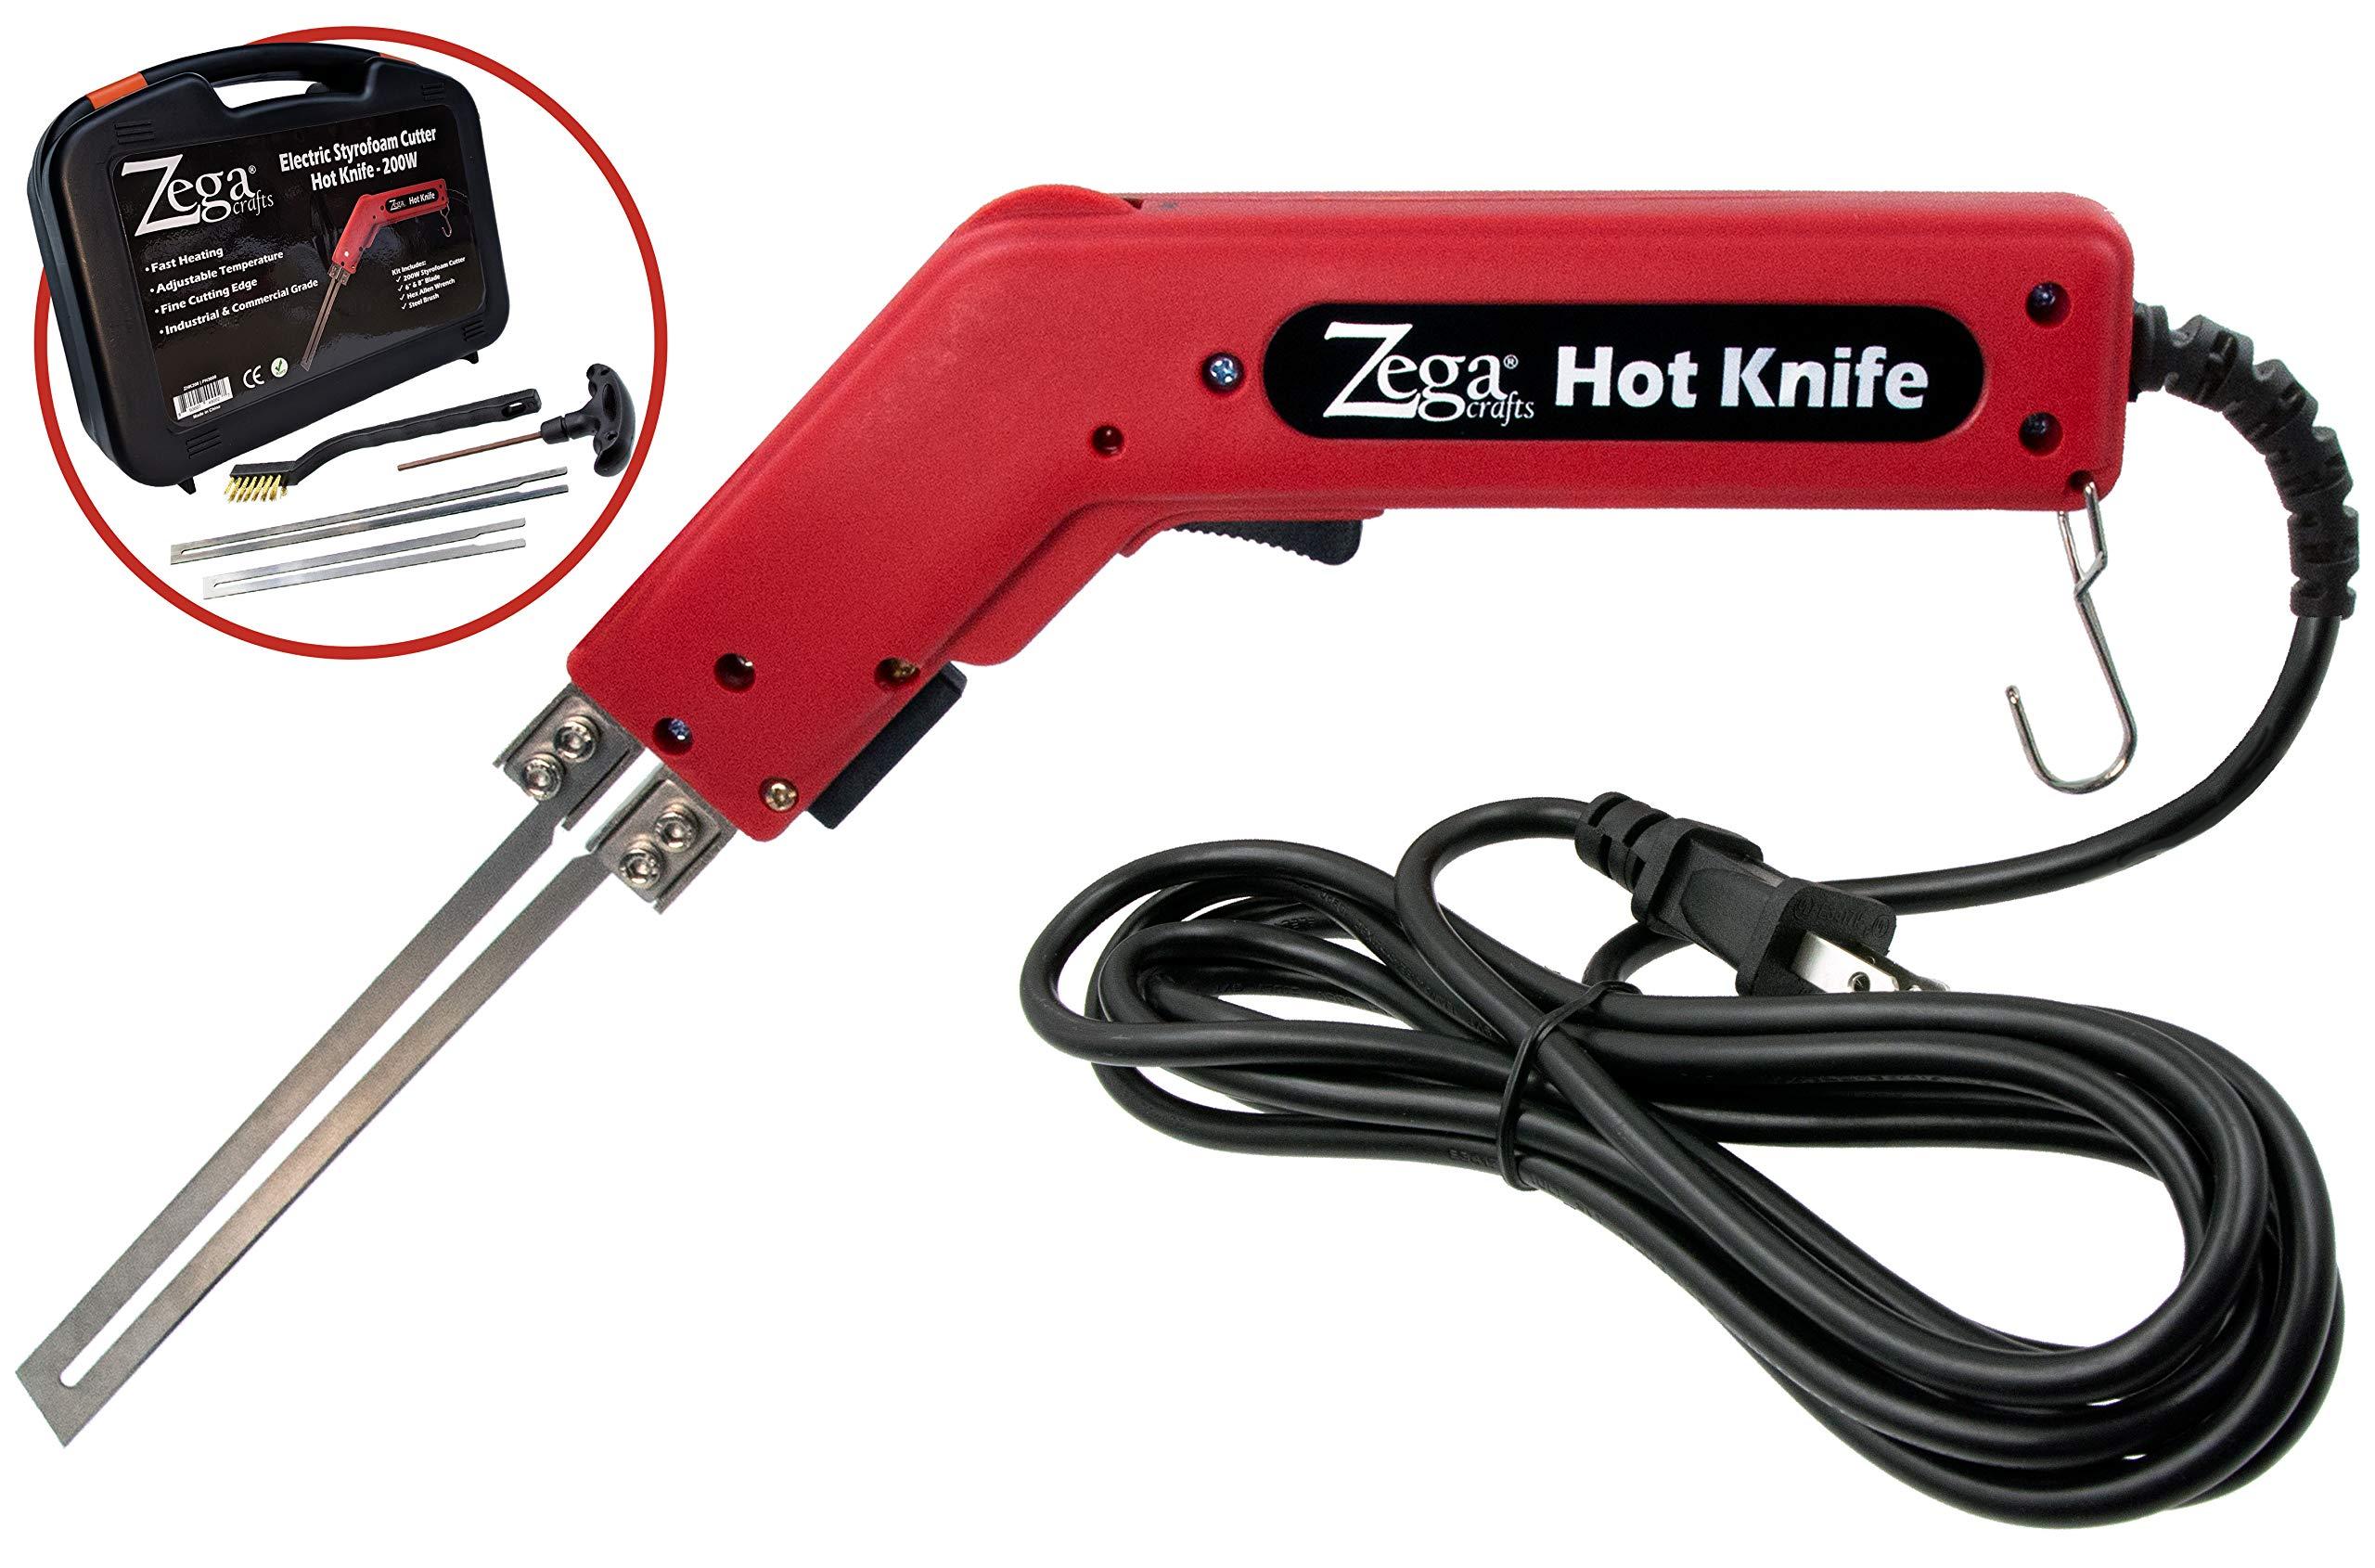 Zega 200 Watt Styrofoam Cutter - Professional 110V Electric Hot Knife & Complete Styrofoam Cutting Kit w/Blades & Accessories by Zega